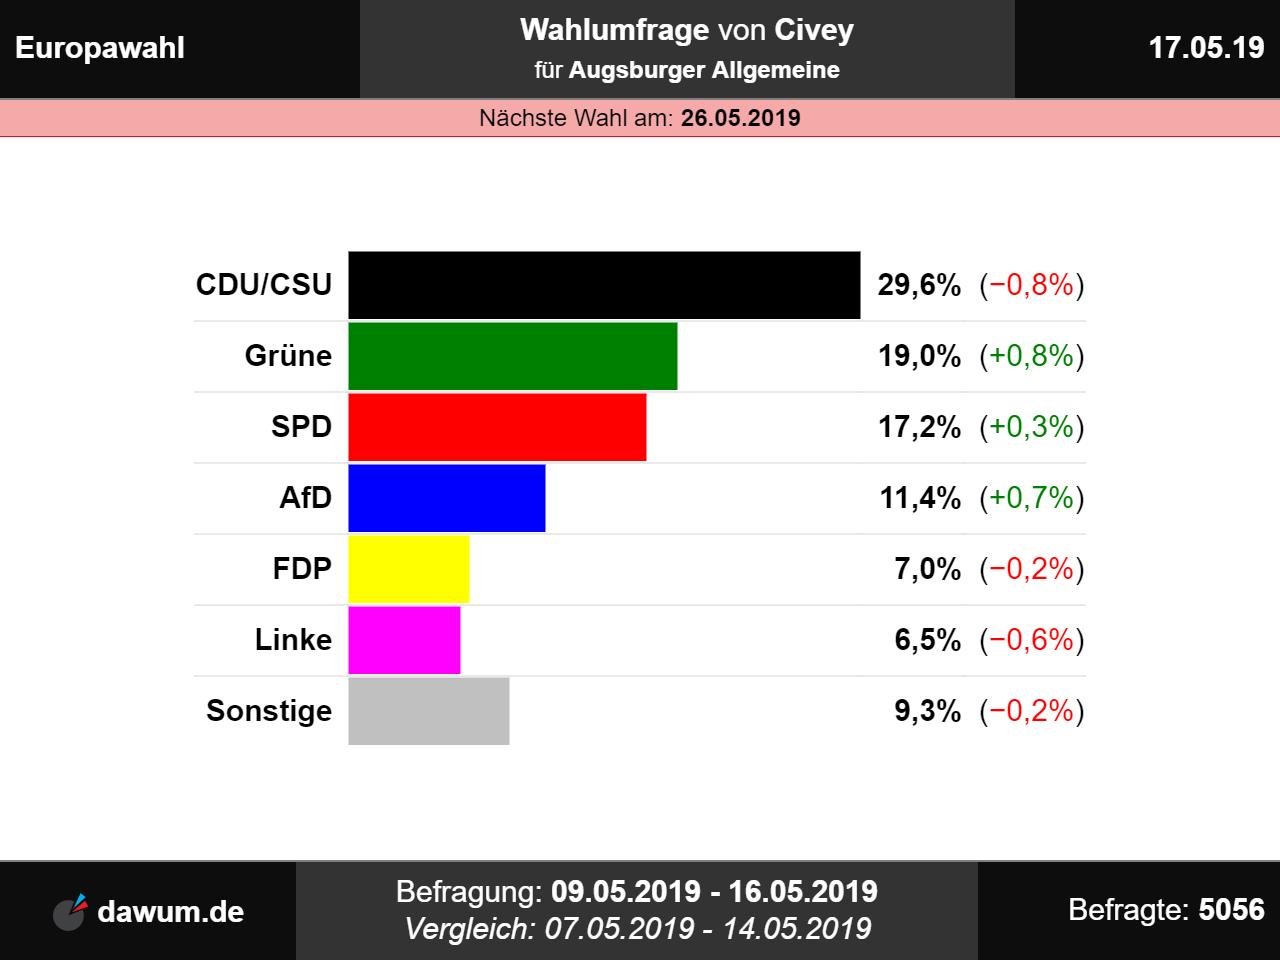 Wahltrend Europawahl